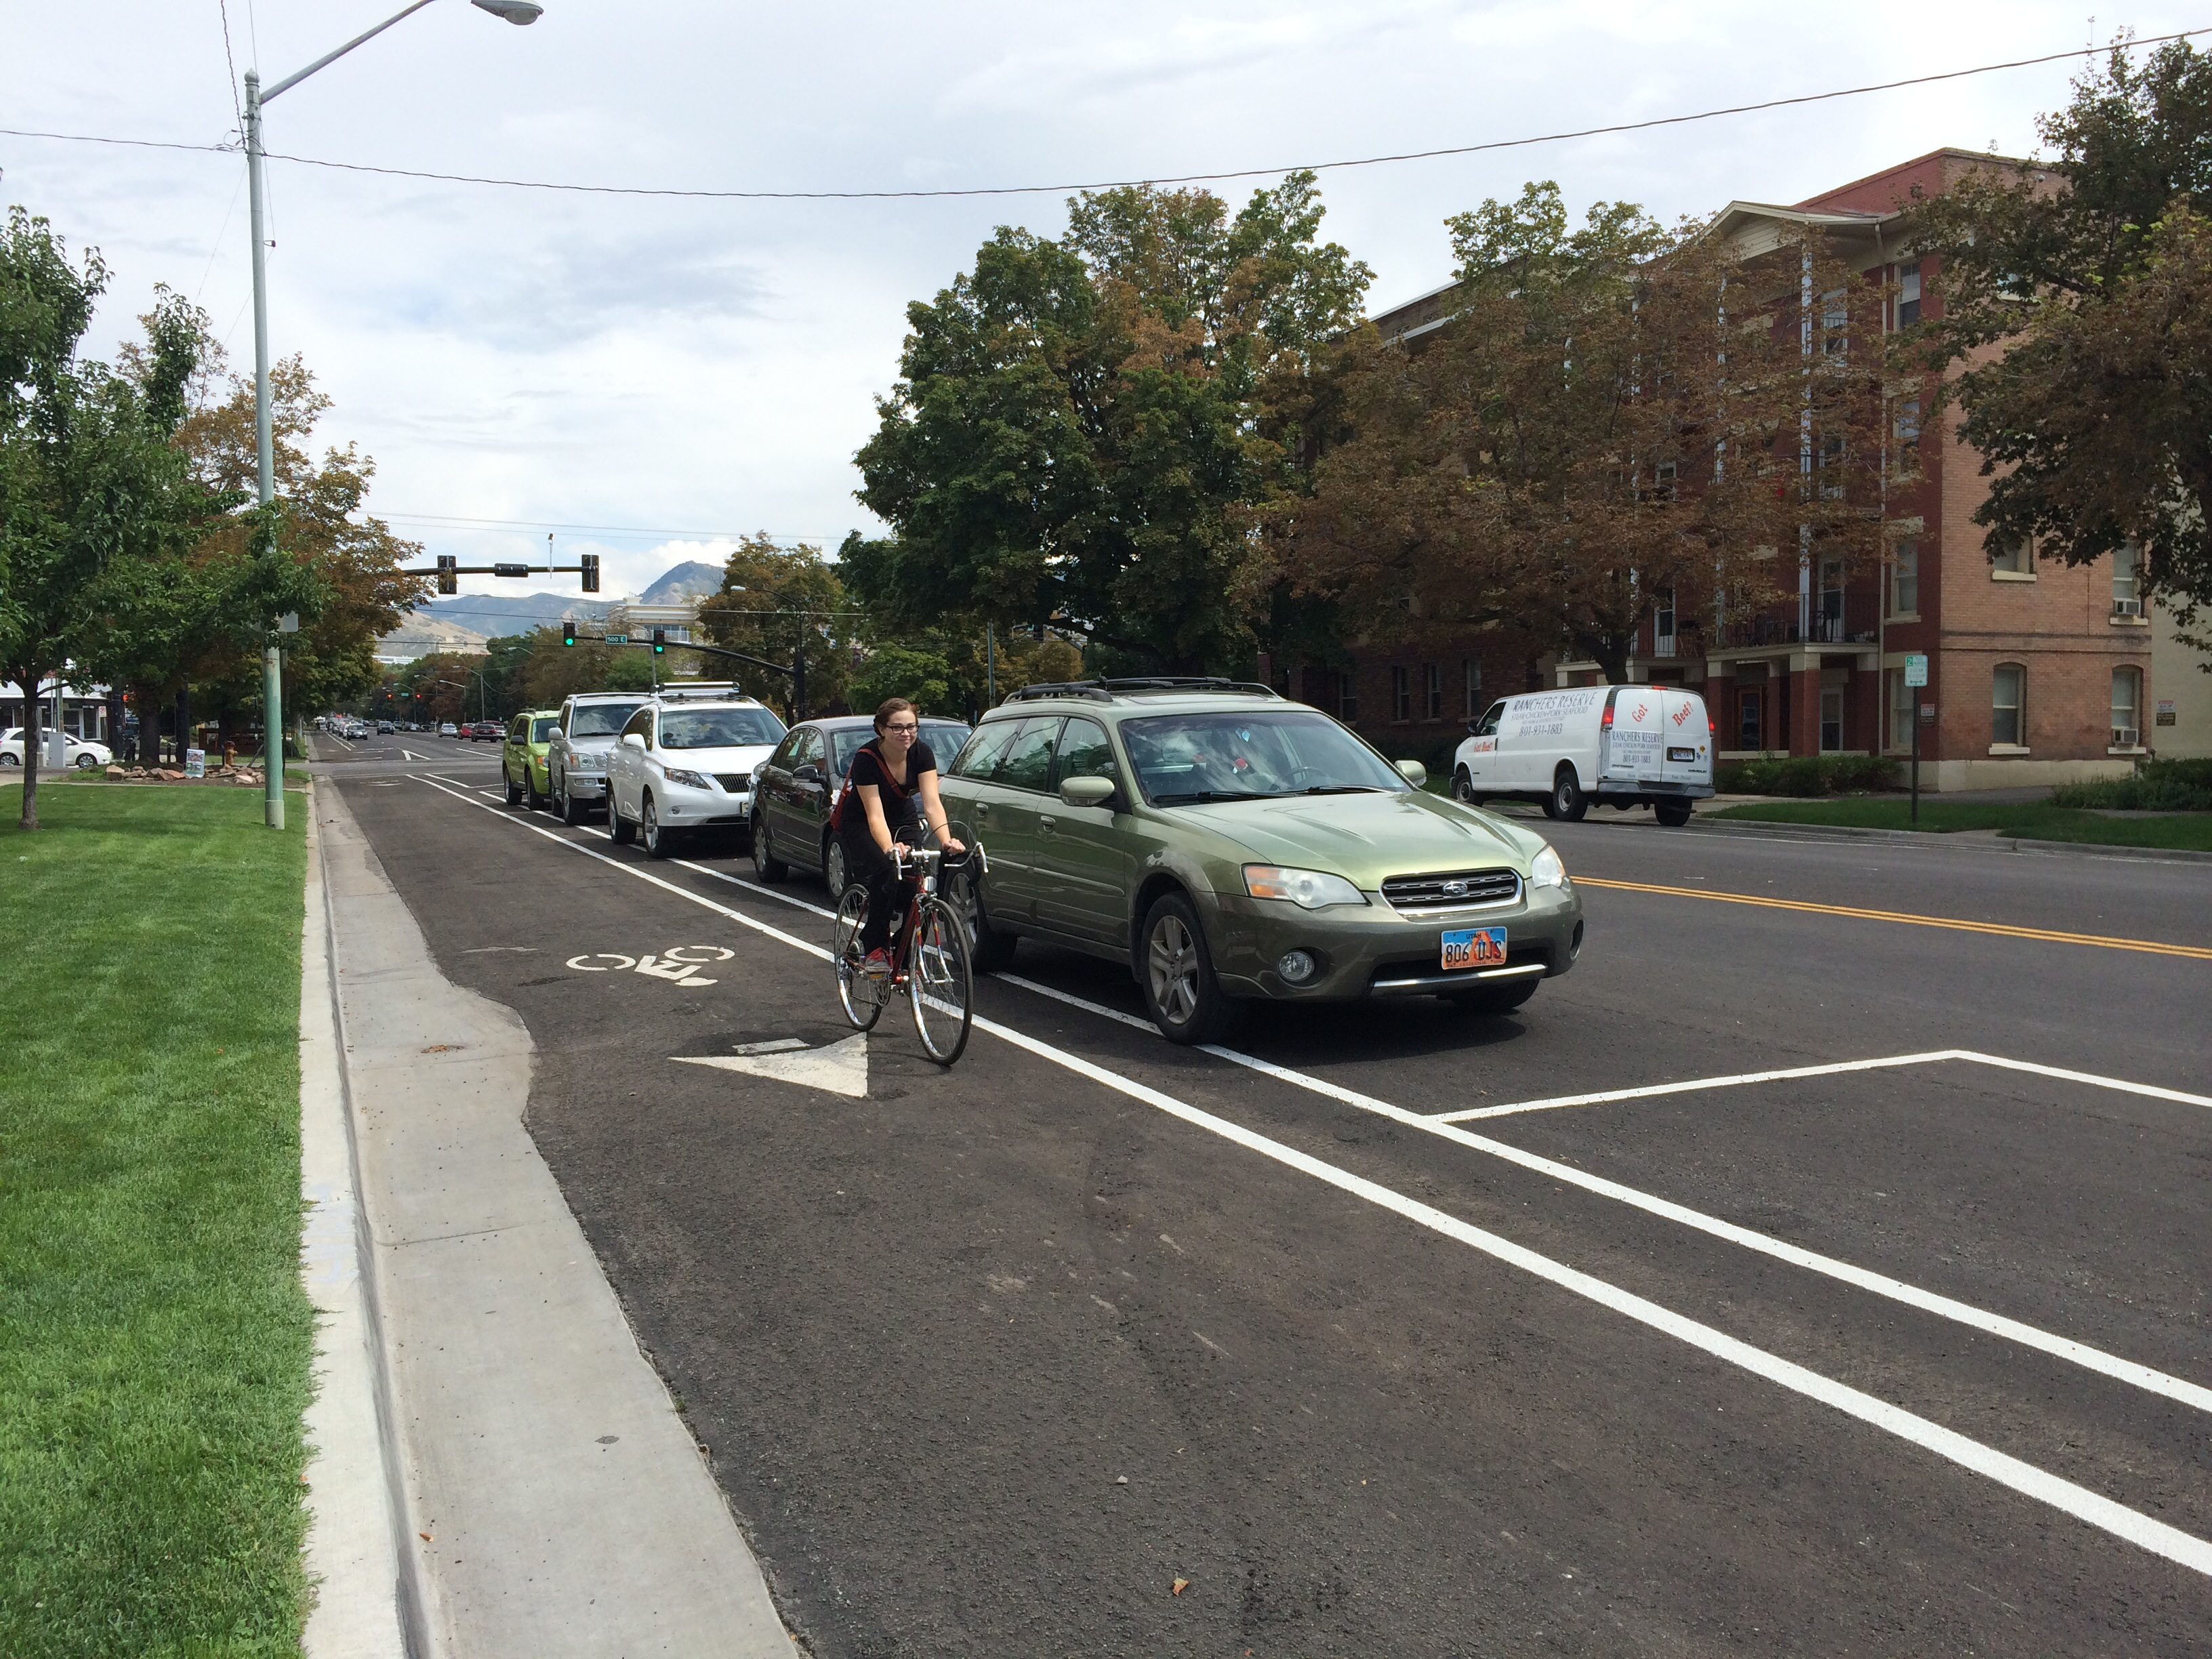 Salt Lake City's 300 S. Protected Bikeway